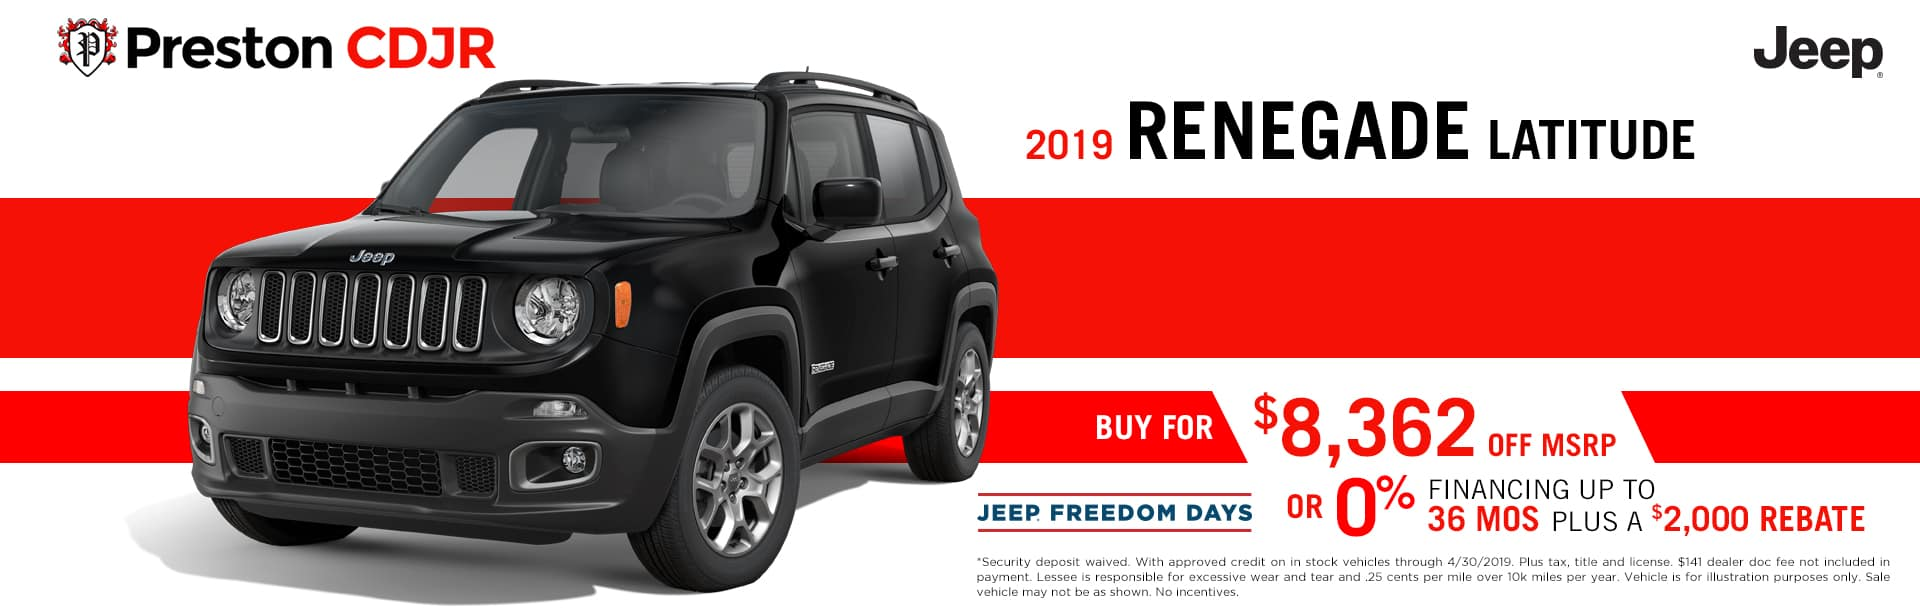 deal jeep renegade latitude